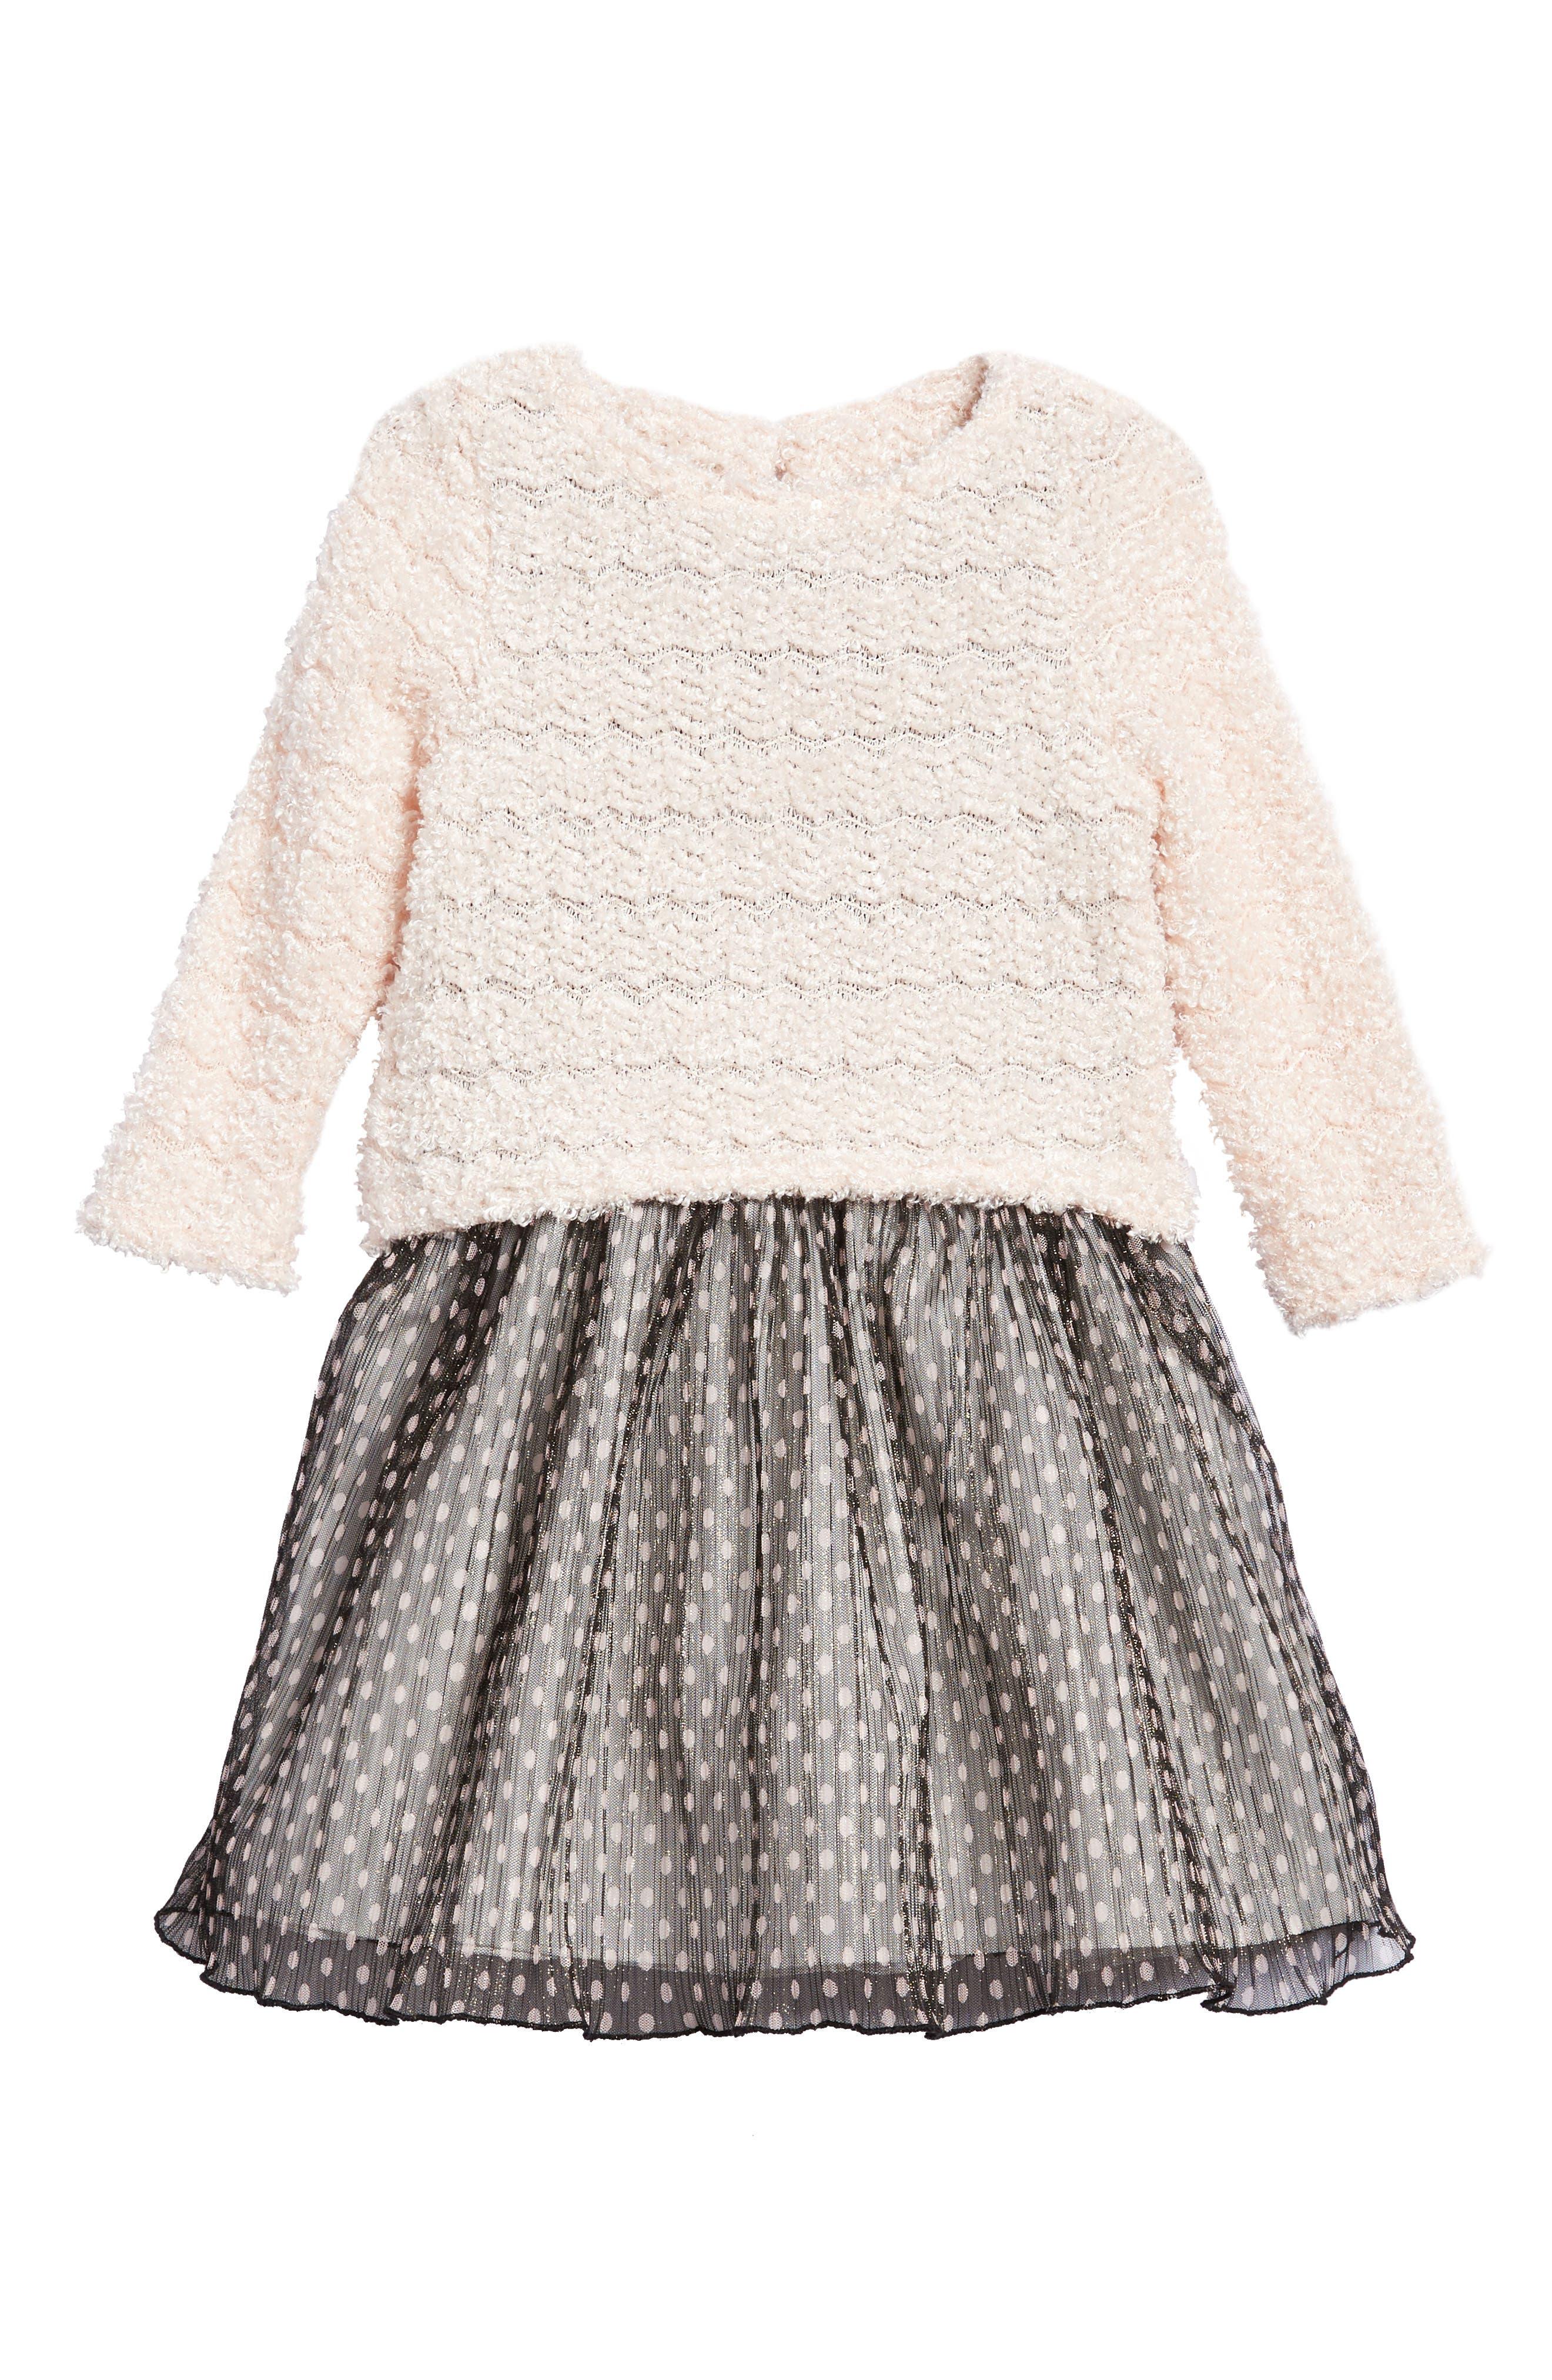 Alternate Image 1 Selected - Pippa & Julie Sweater & Dress Set (Toddler Girls & Little Girls)